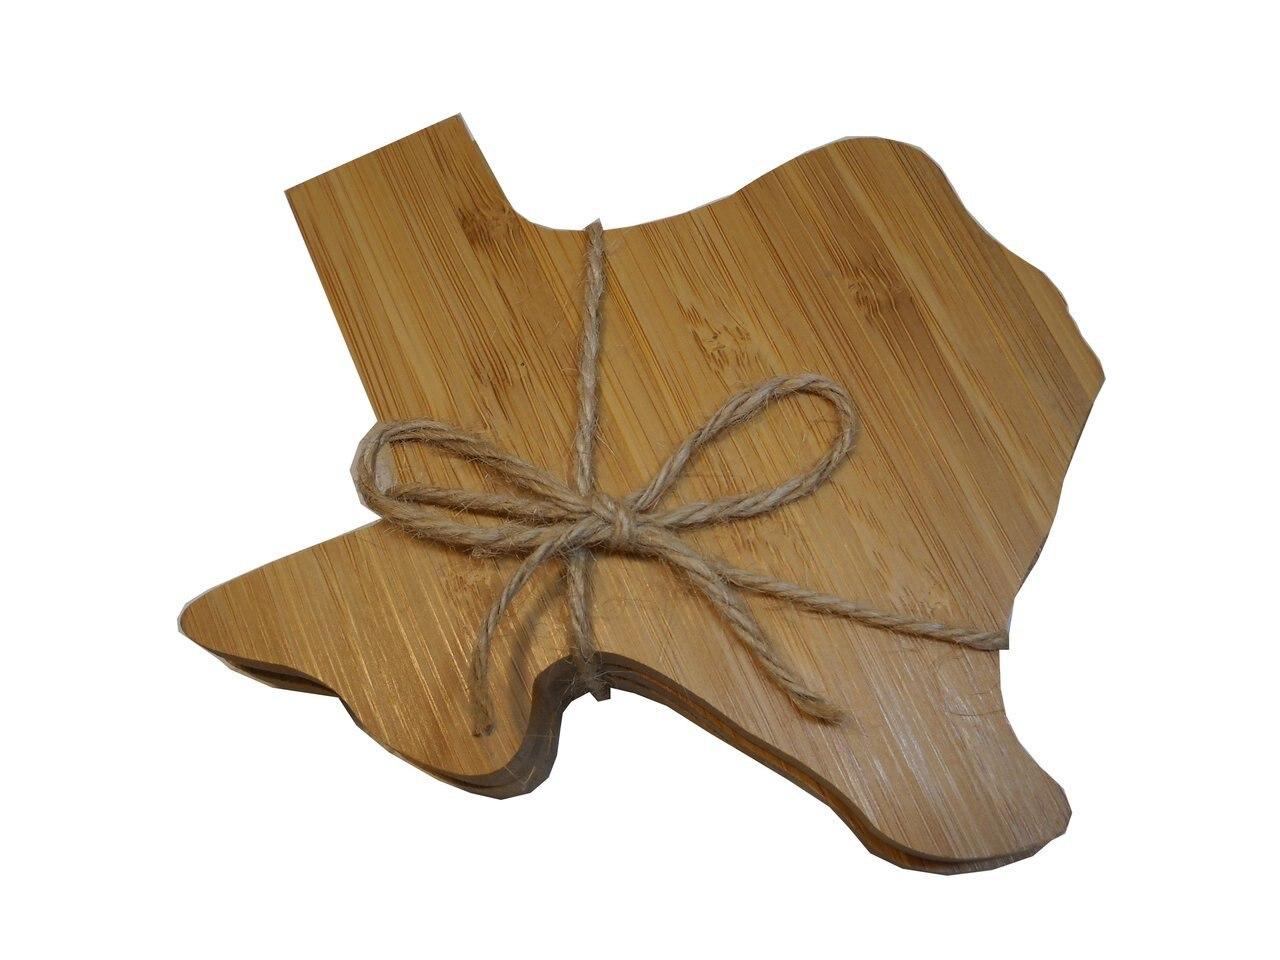 Texas Shaped Bamboo Coaster Set 1